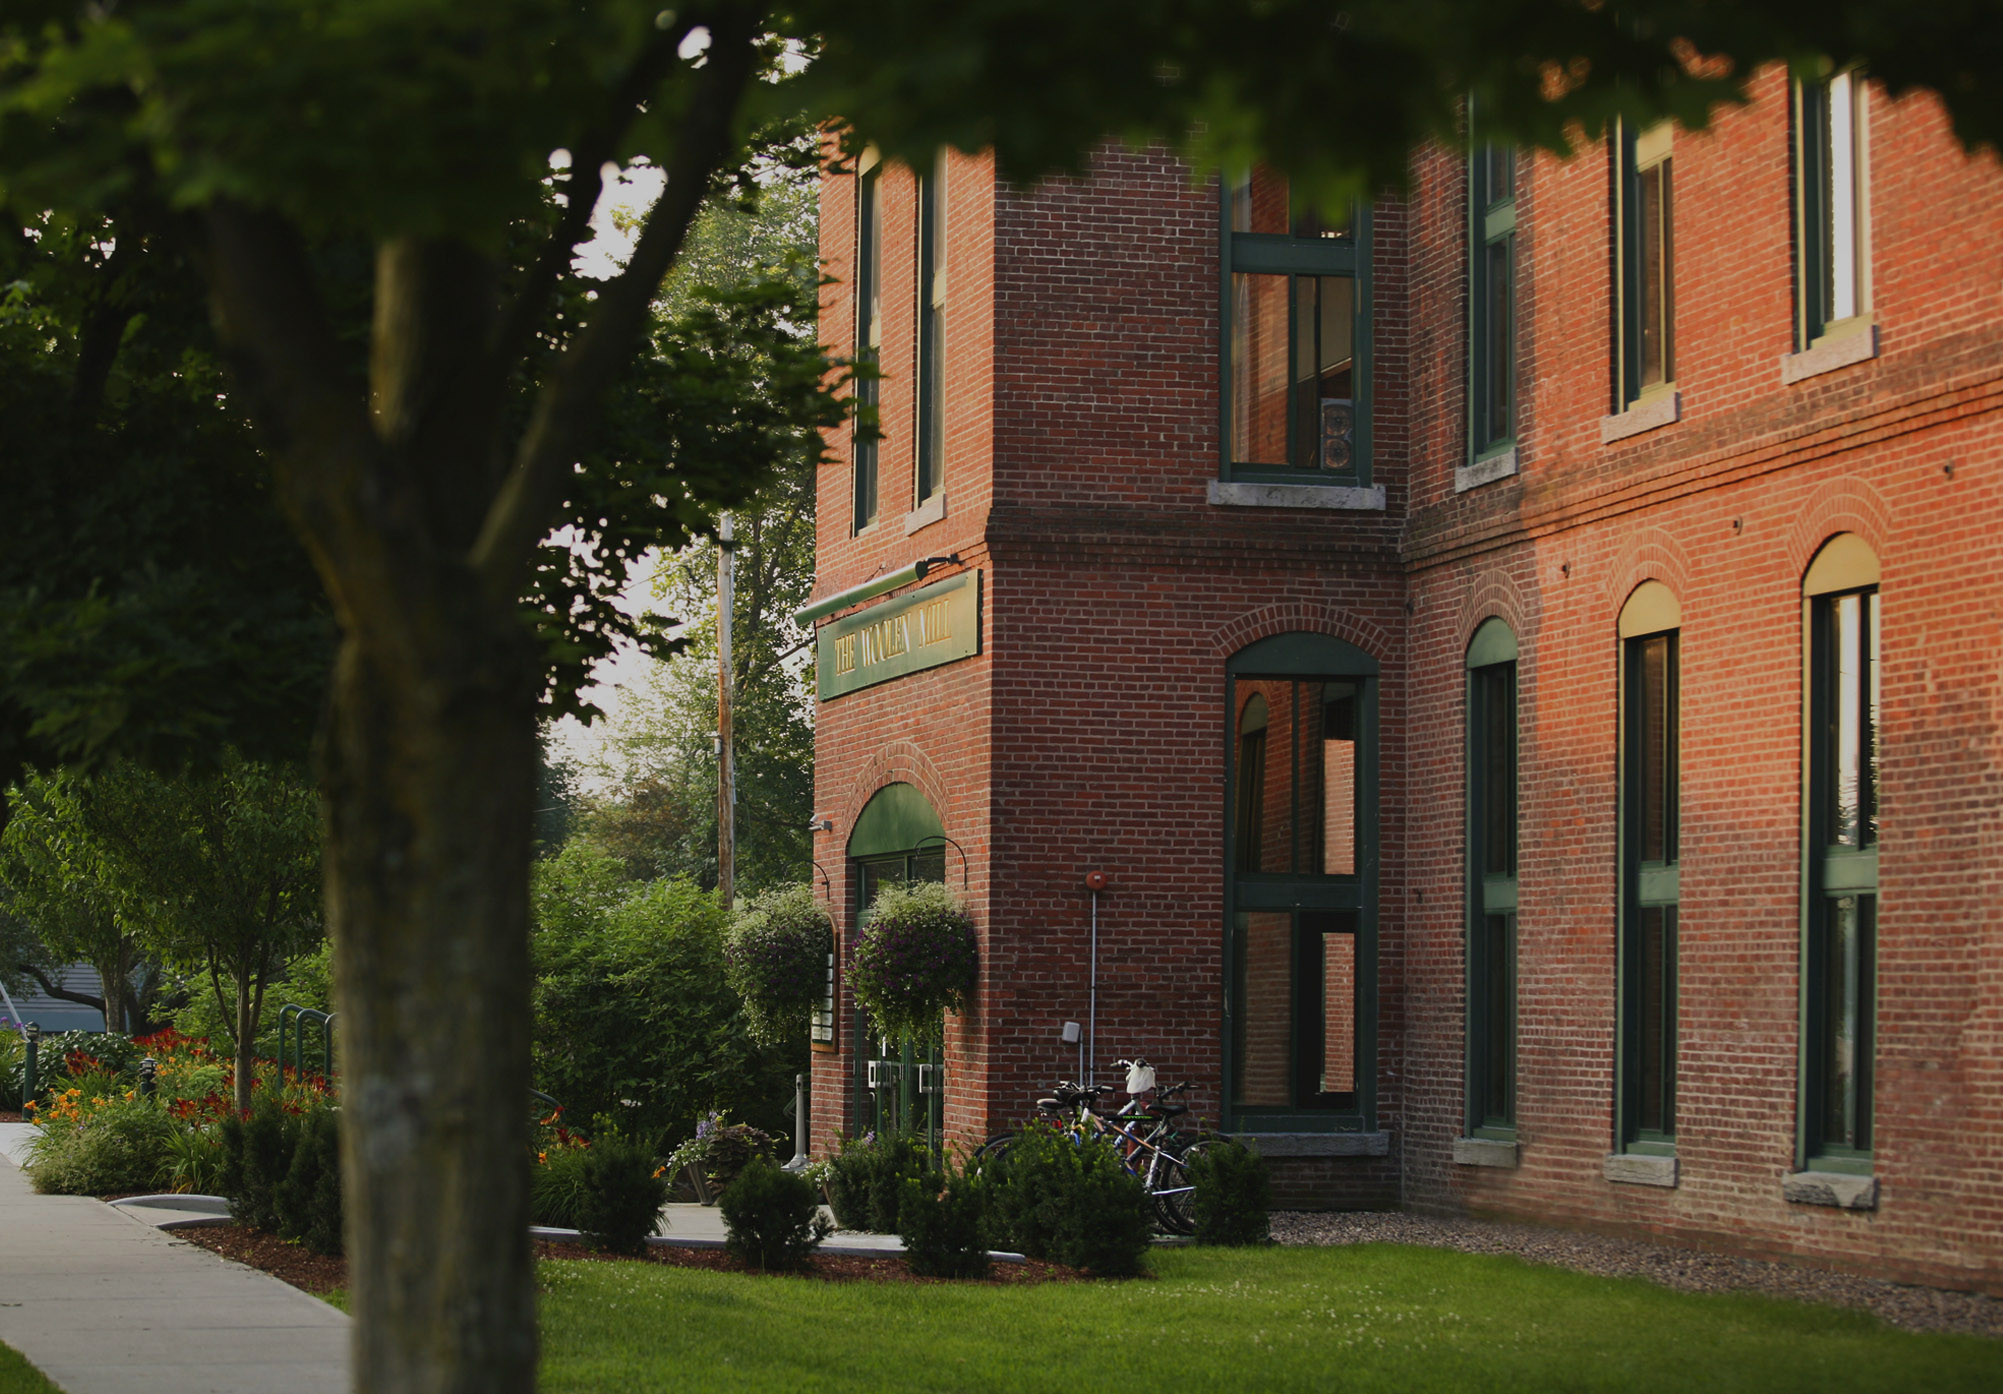 The Woolen Mill loft apartments in Winooski, Vermont